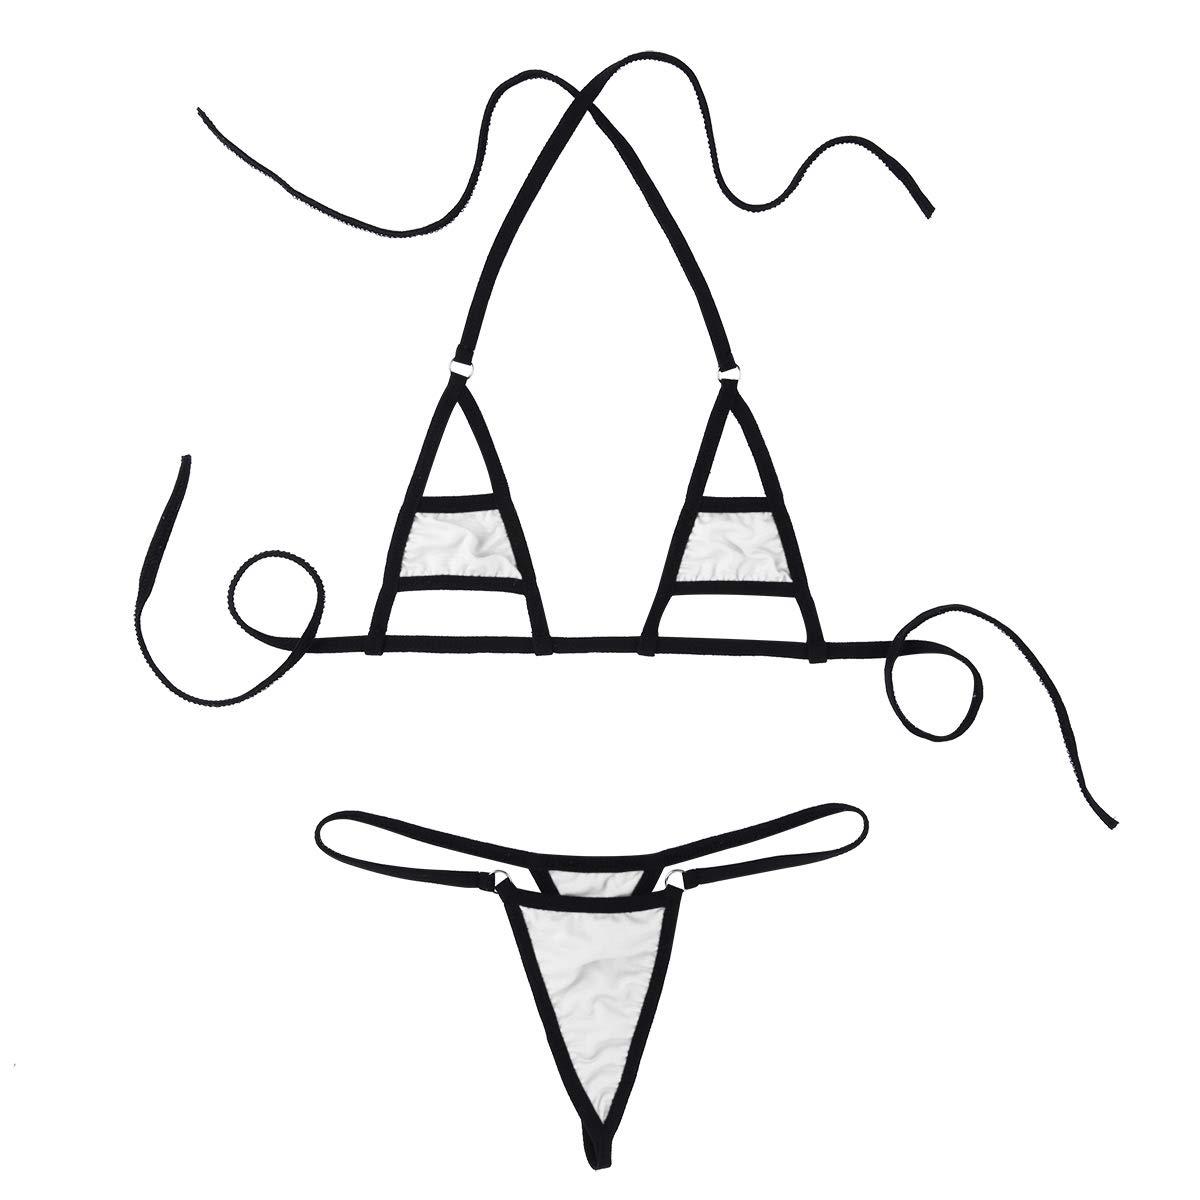 YiZYiF Women's Sheer Extreme Bikini Halterneck Top and Tie Sides Micro Thong Sets (Cutout White)